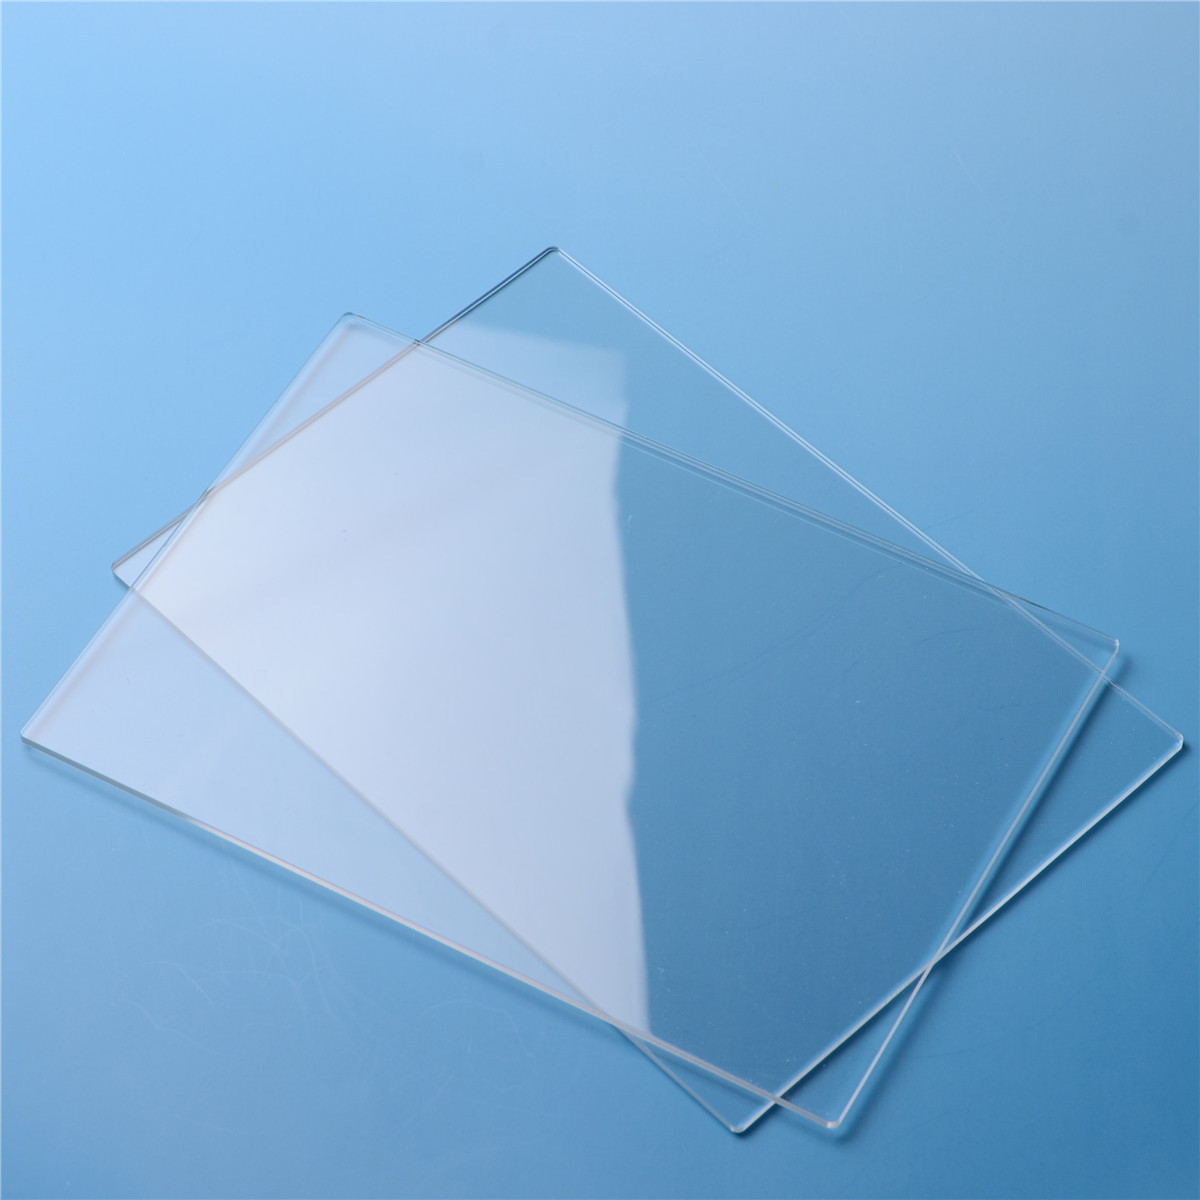 2Pcs/set 3mm Clear Acrylic Cutting Plates Plastic Transparent Sawn ...